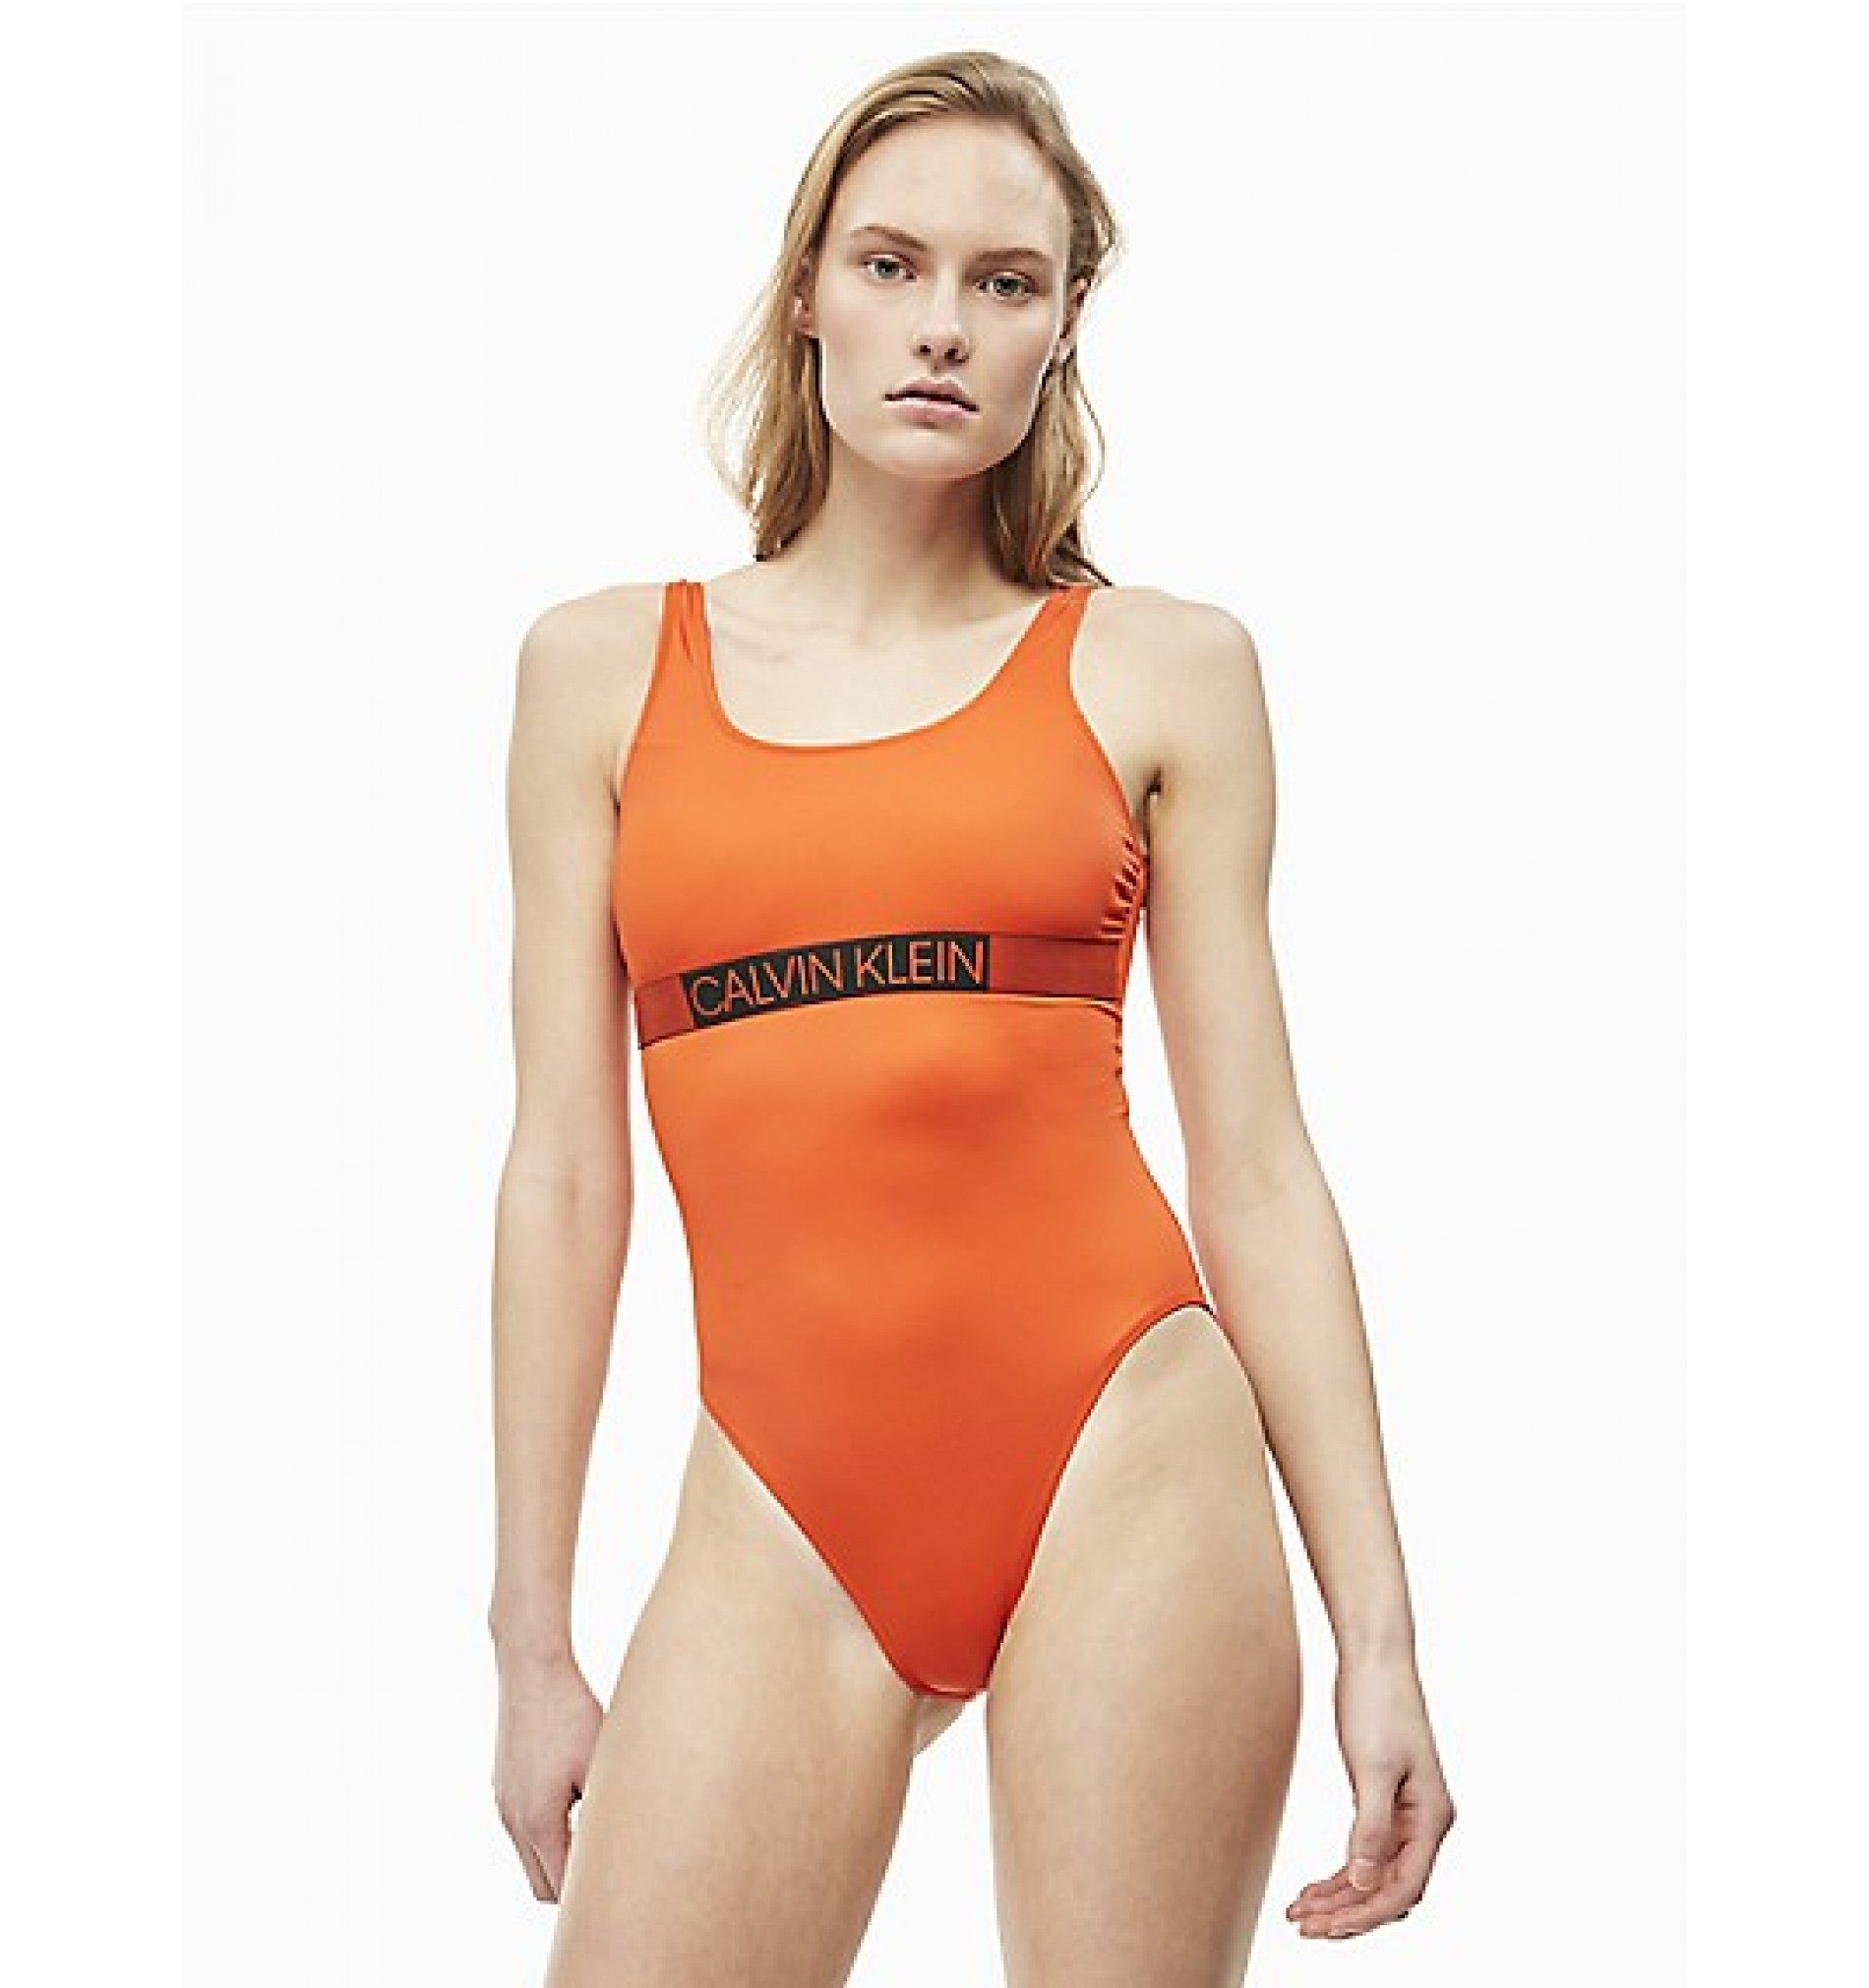 dámske plavky - JEDNODIELNE 'CORE ICON' oranžové  659